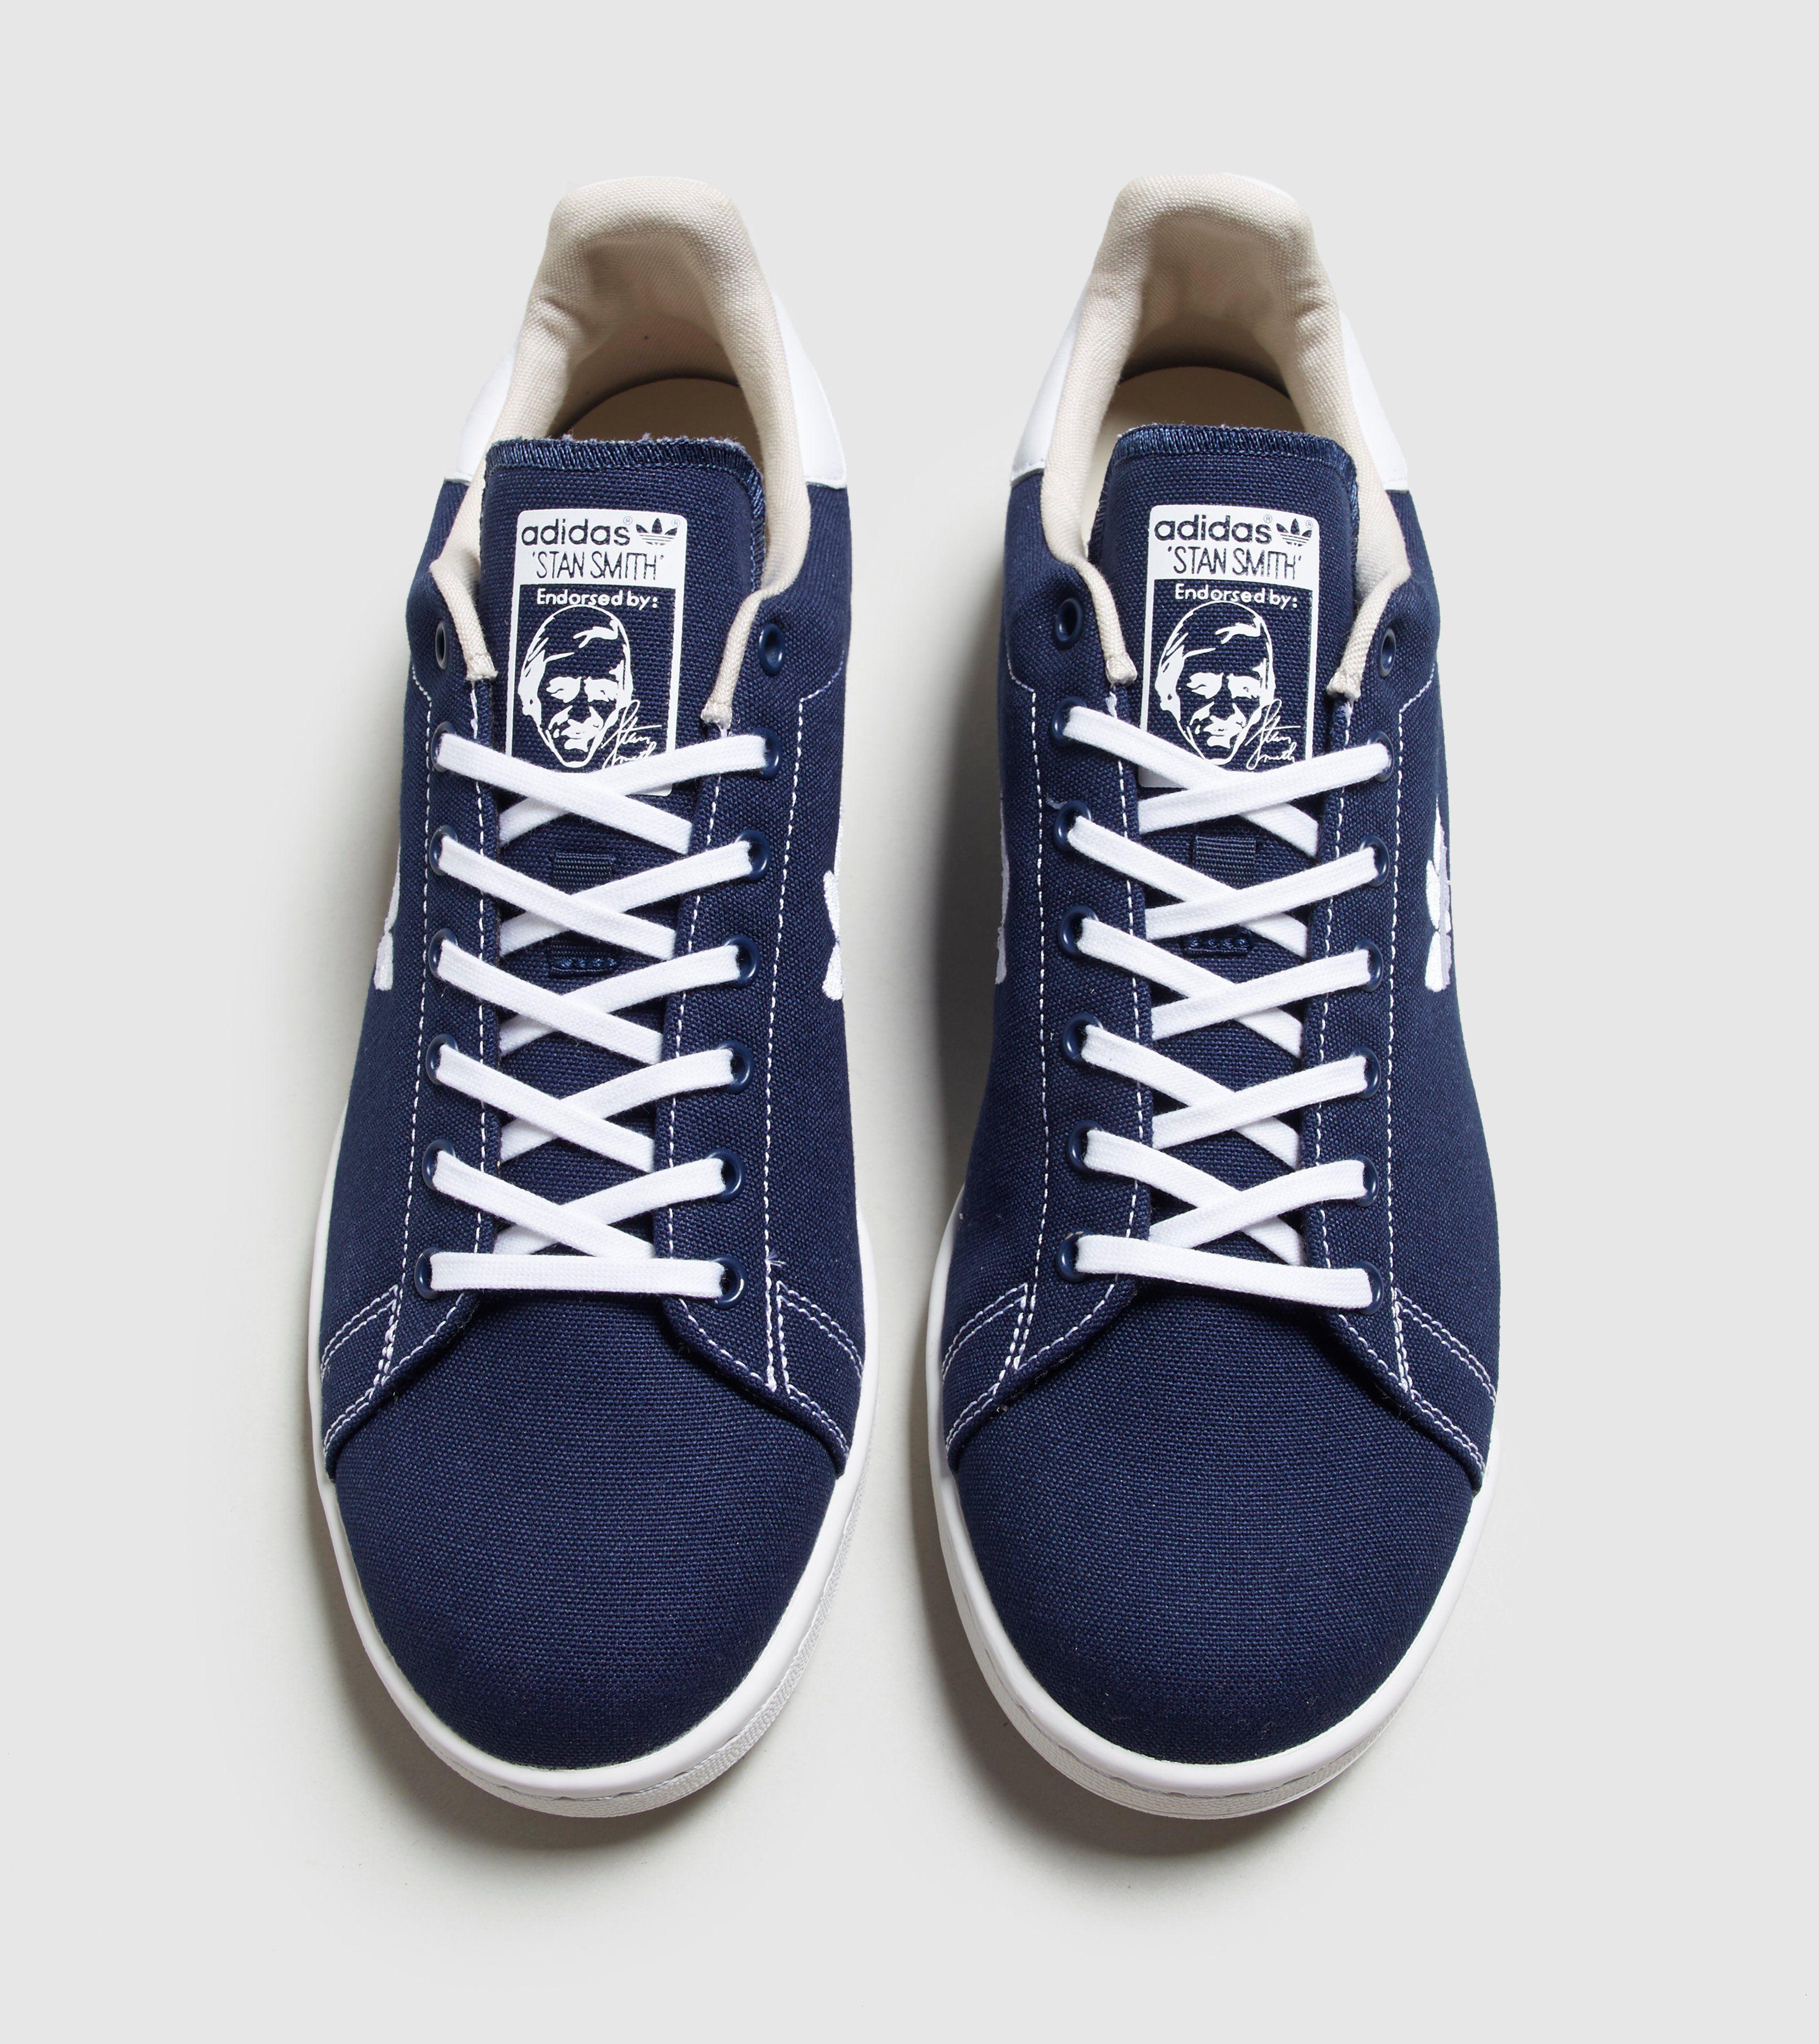 adidas Originals Stan Smith Trefoil